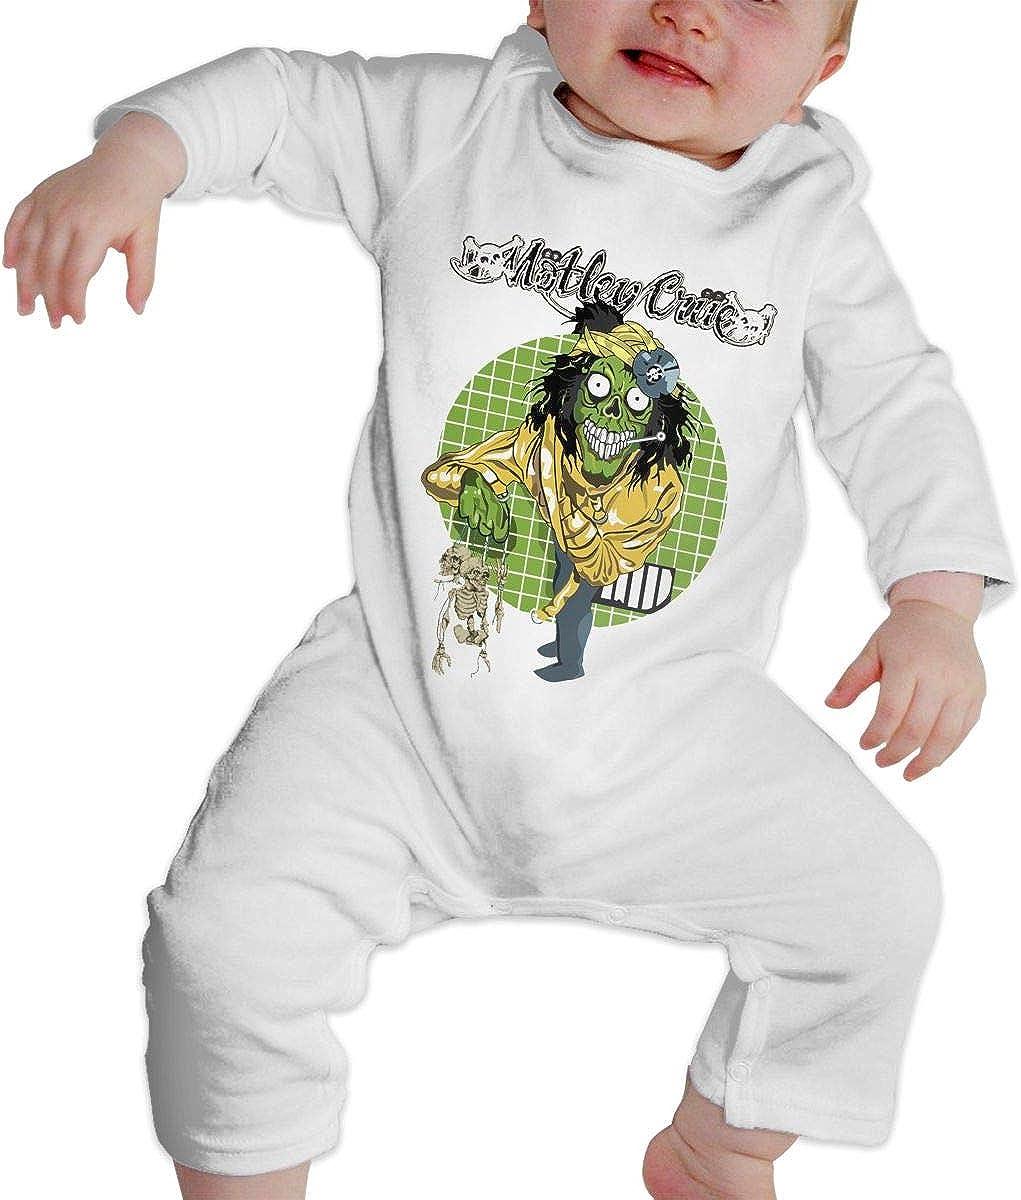 Qq1-asd-store Motley Crue Boys//Girls Baby Cotton Long Sleeve Romper Warm Bodysuit